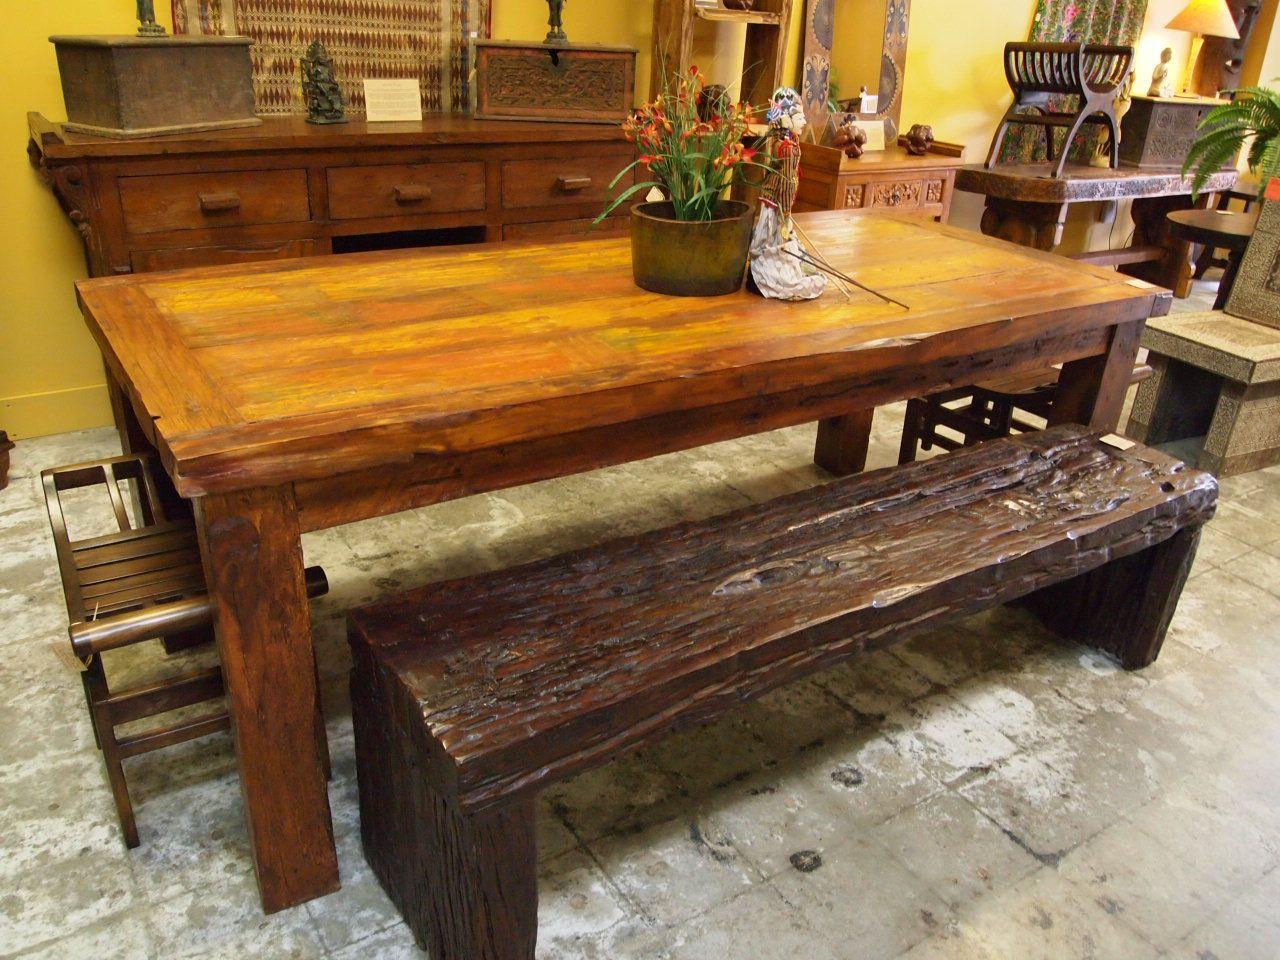 Reclaimed Wood Dining Table & Rustic Ironwood bench. Visit Gado Gado ...